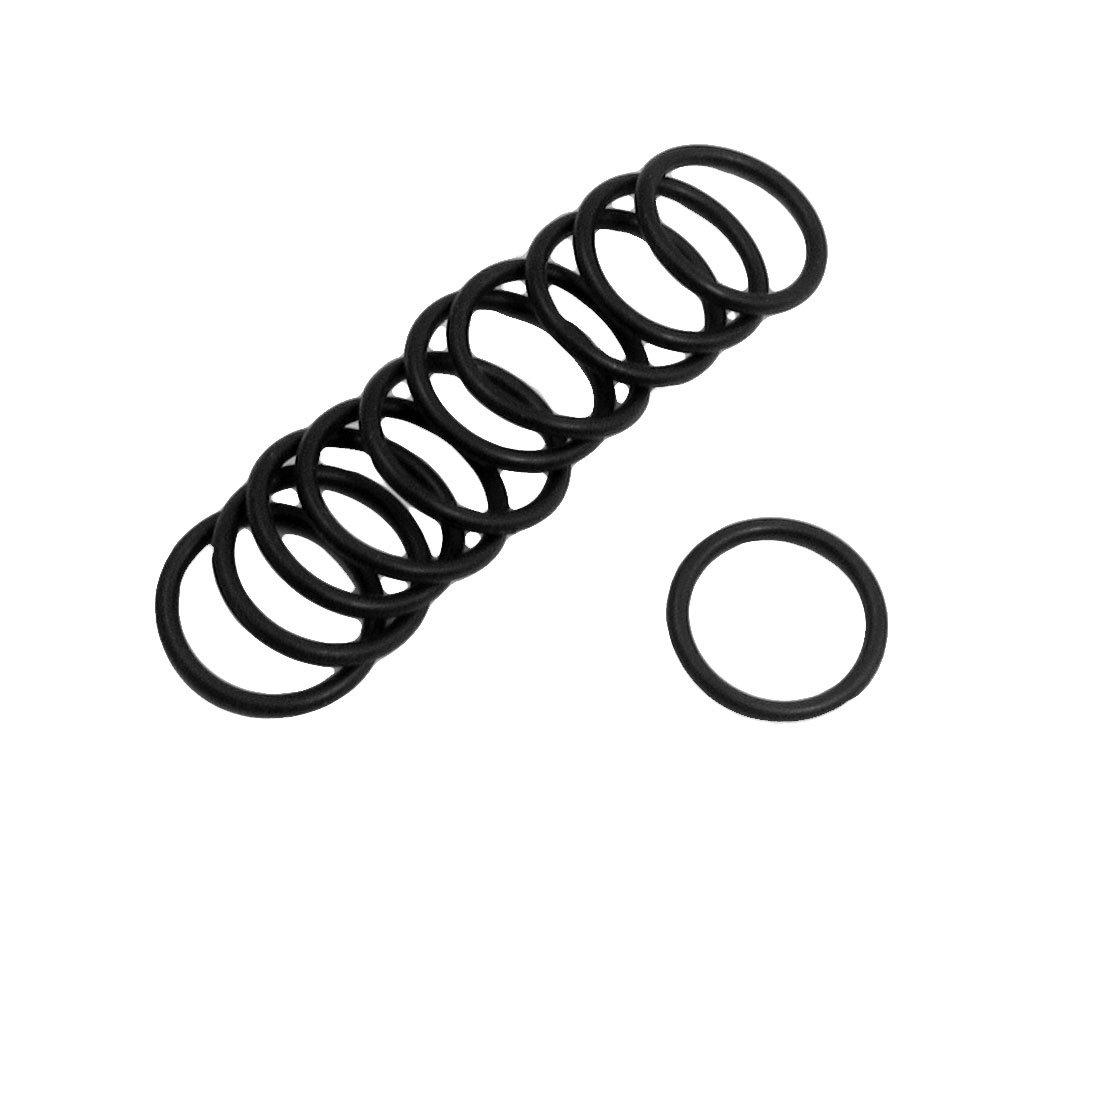 10/St/ück Schwarz 20/x/2/mm Kautschuk Sourcingmap Dichtungsring////O-Ring